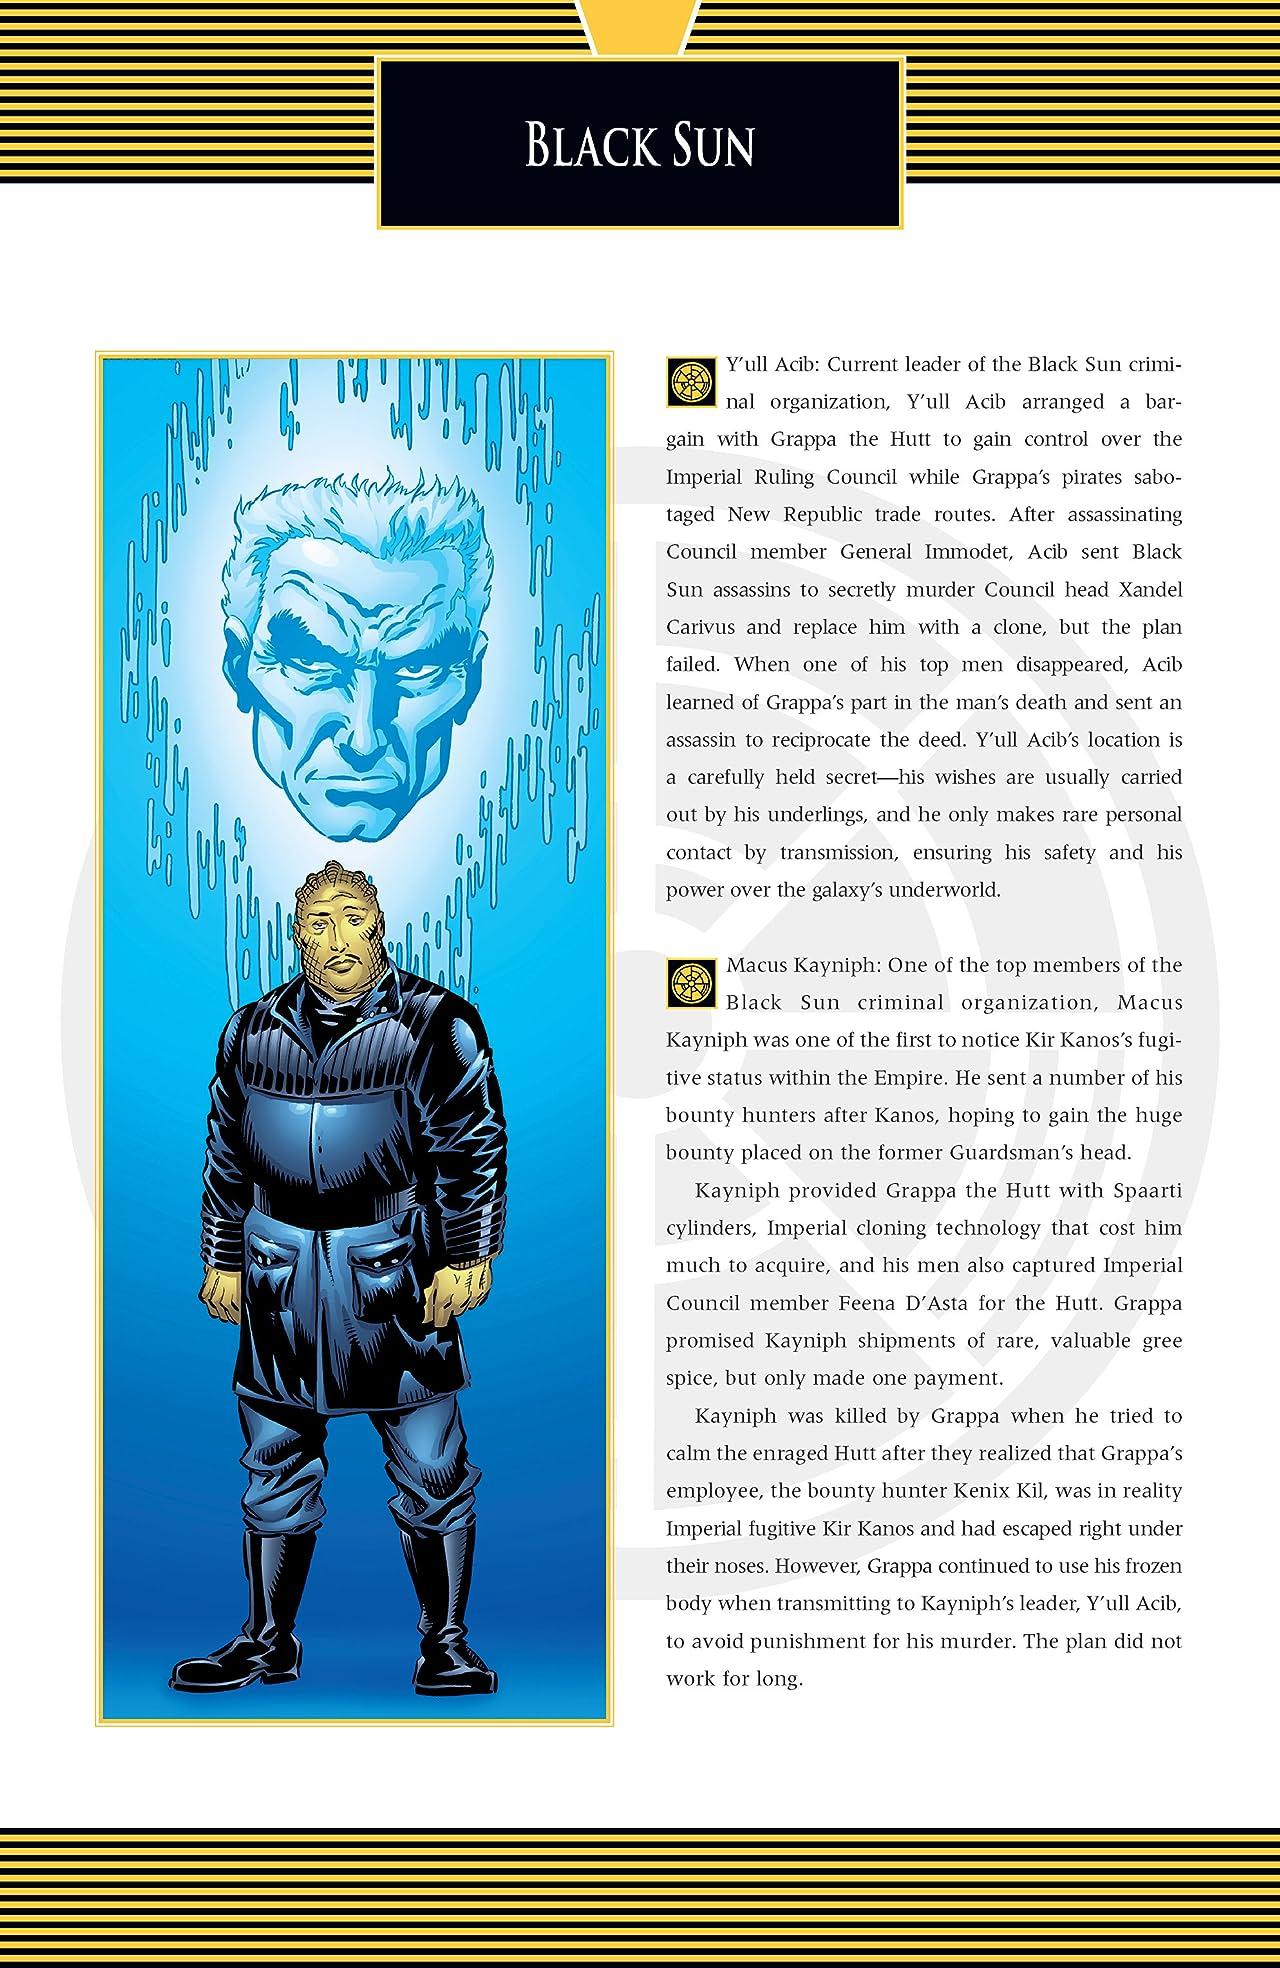 Star Wars Handbook (1998-2000) #2: Crimson Empire